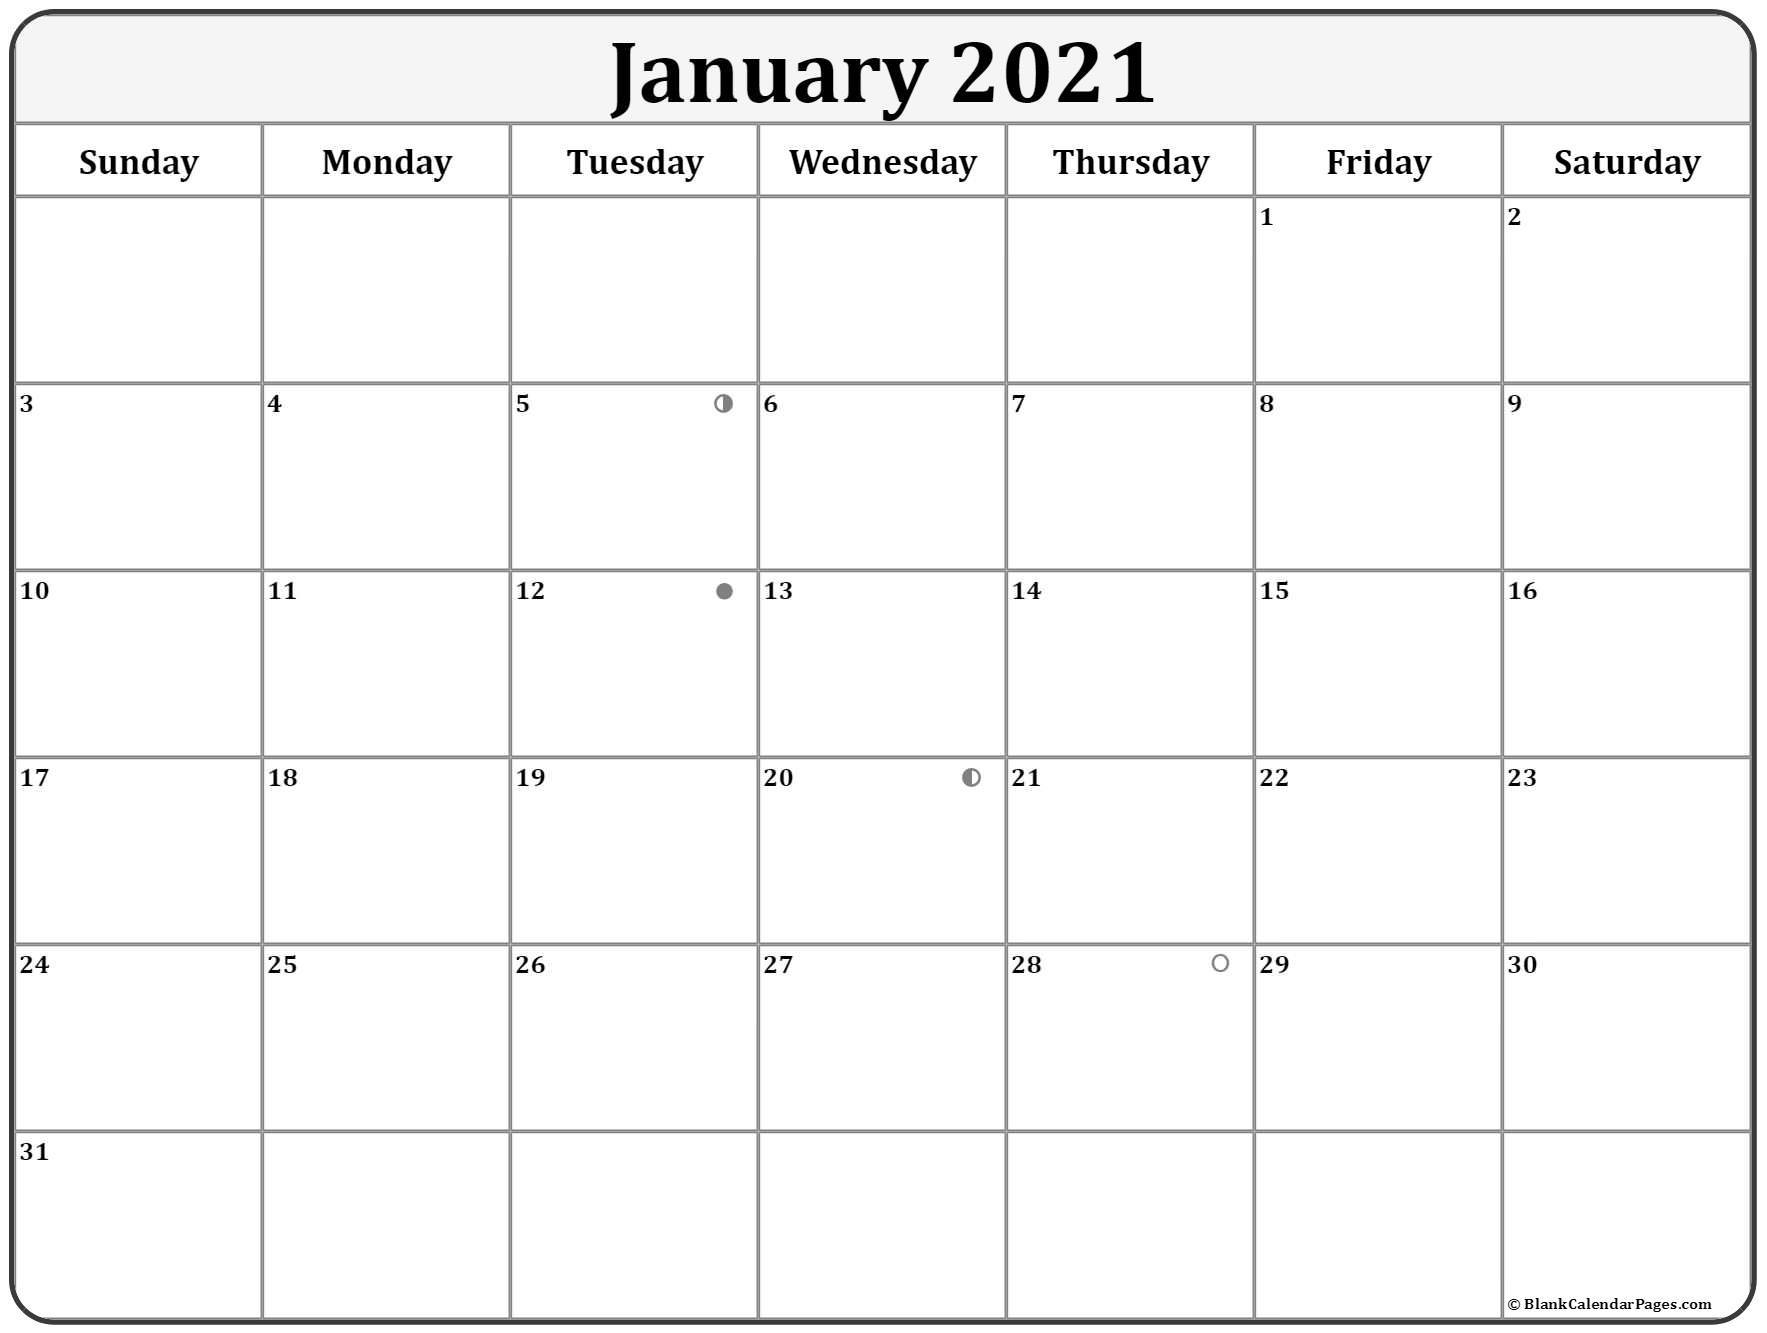 January 2021 Lunar Calendar | Moon Phase Calendar  Printable Lunar Calendar 2021